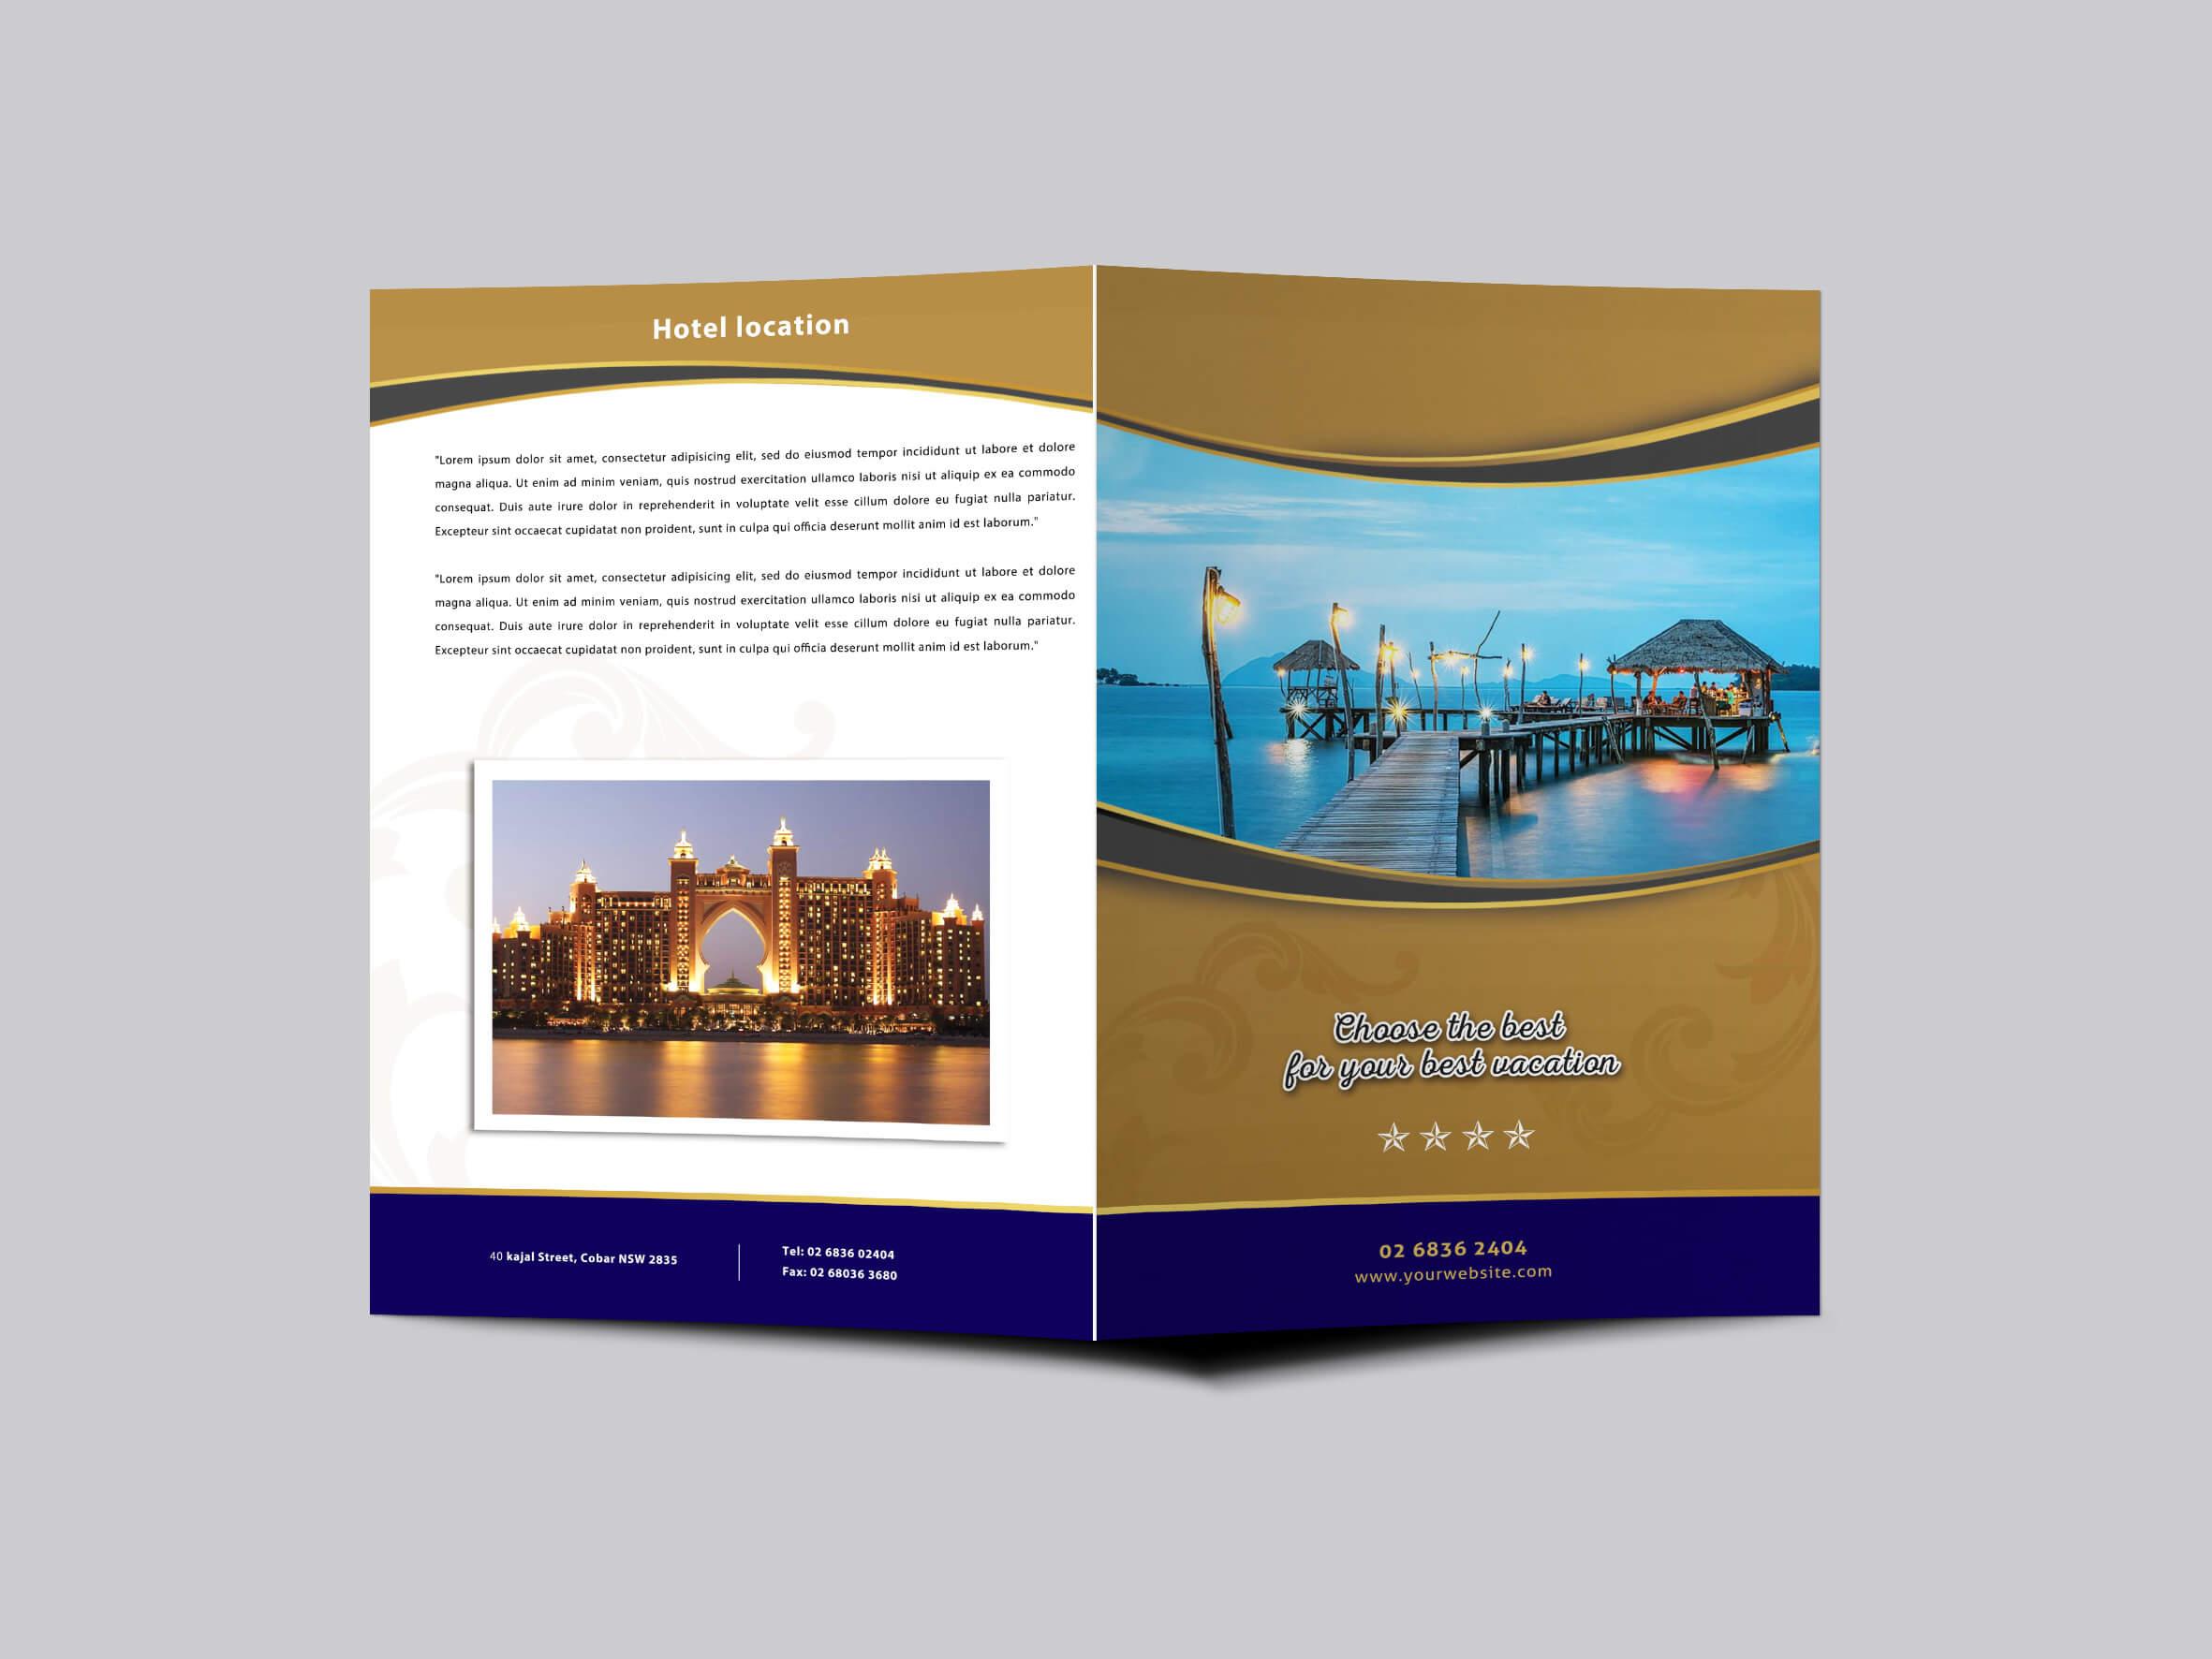 Hotel Resort Bi Fold Brochure Design Templatearun Kumar Within Hotel Brochure Design Templates